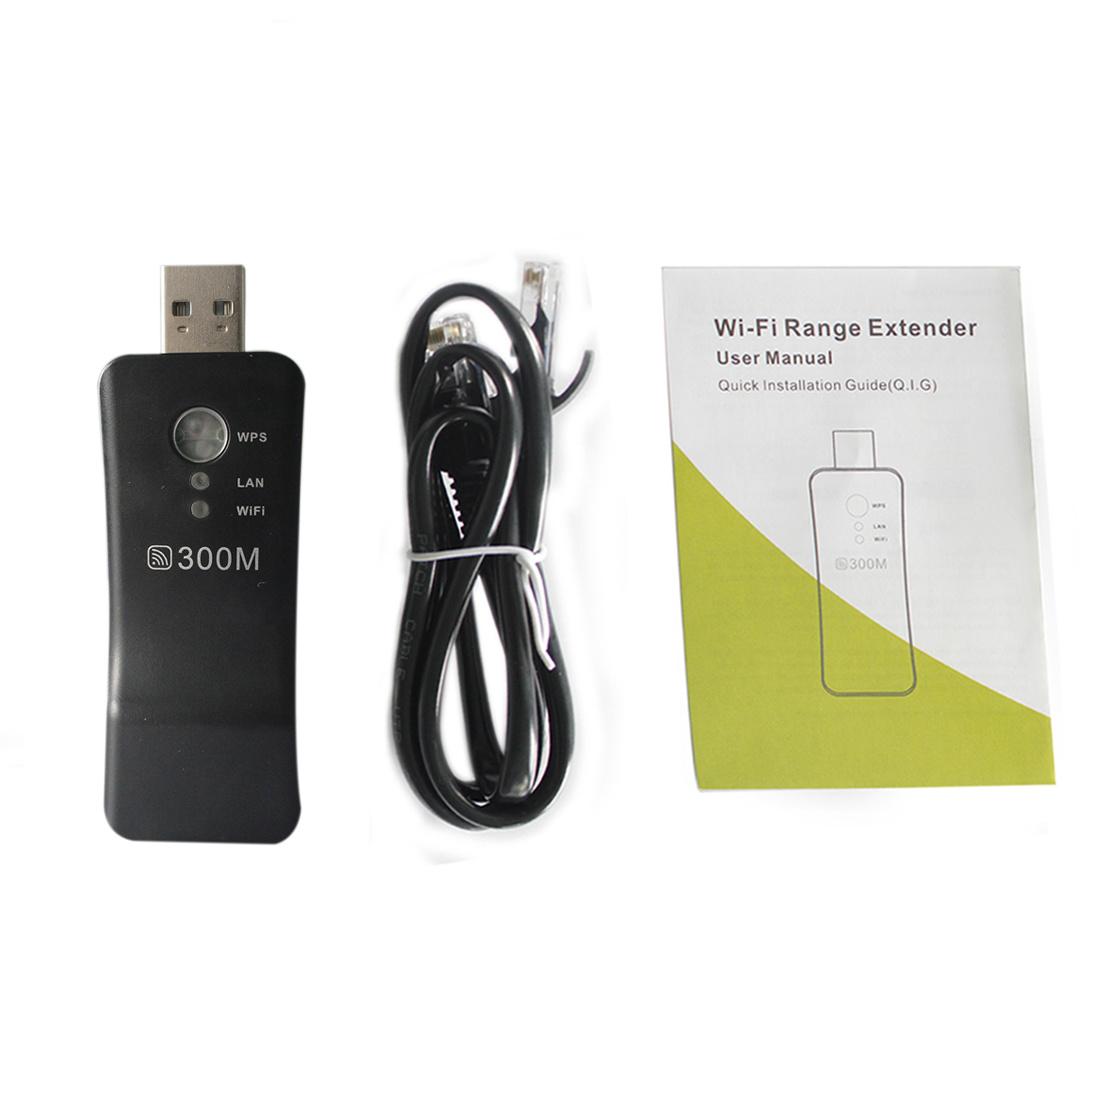 NOYOKERE 300Mpbs Portable Wireless WiFi Smart TV Network Adapter Universal HDTV RJ45 Repeater AP USB WPS